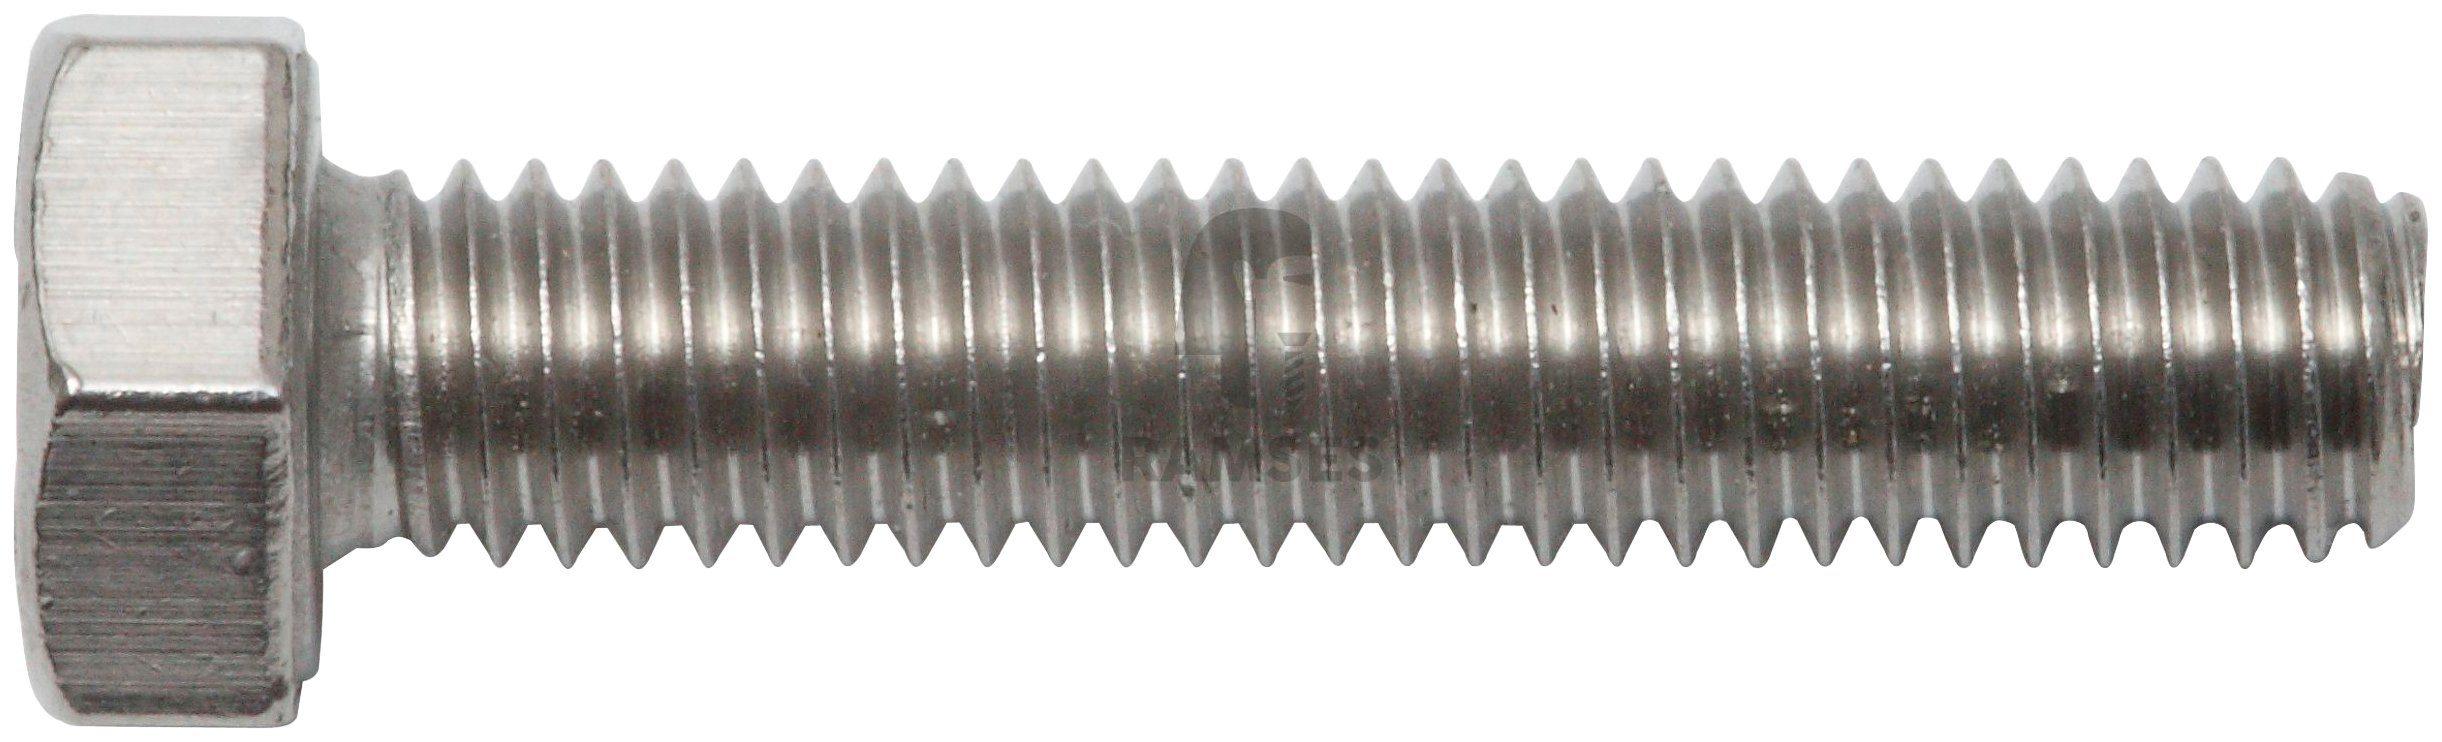 RAMSES Schrauben , Sechskantschraube M10 x 60 mm 20 Stk.